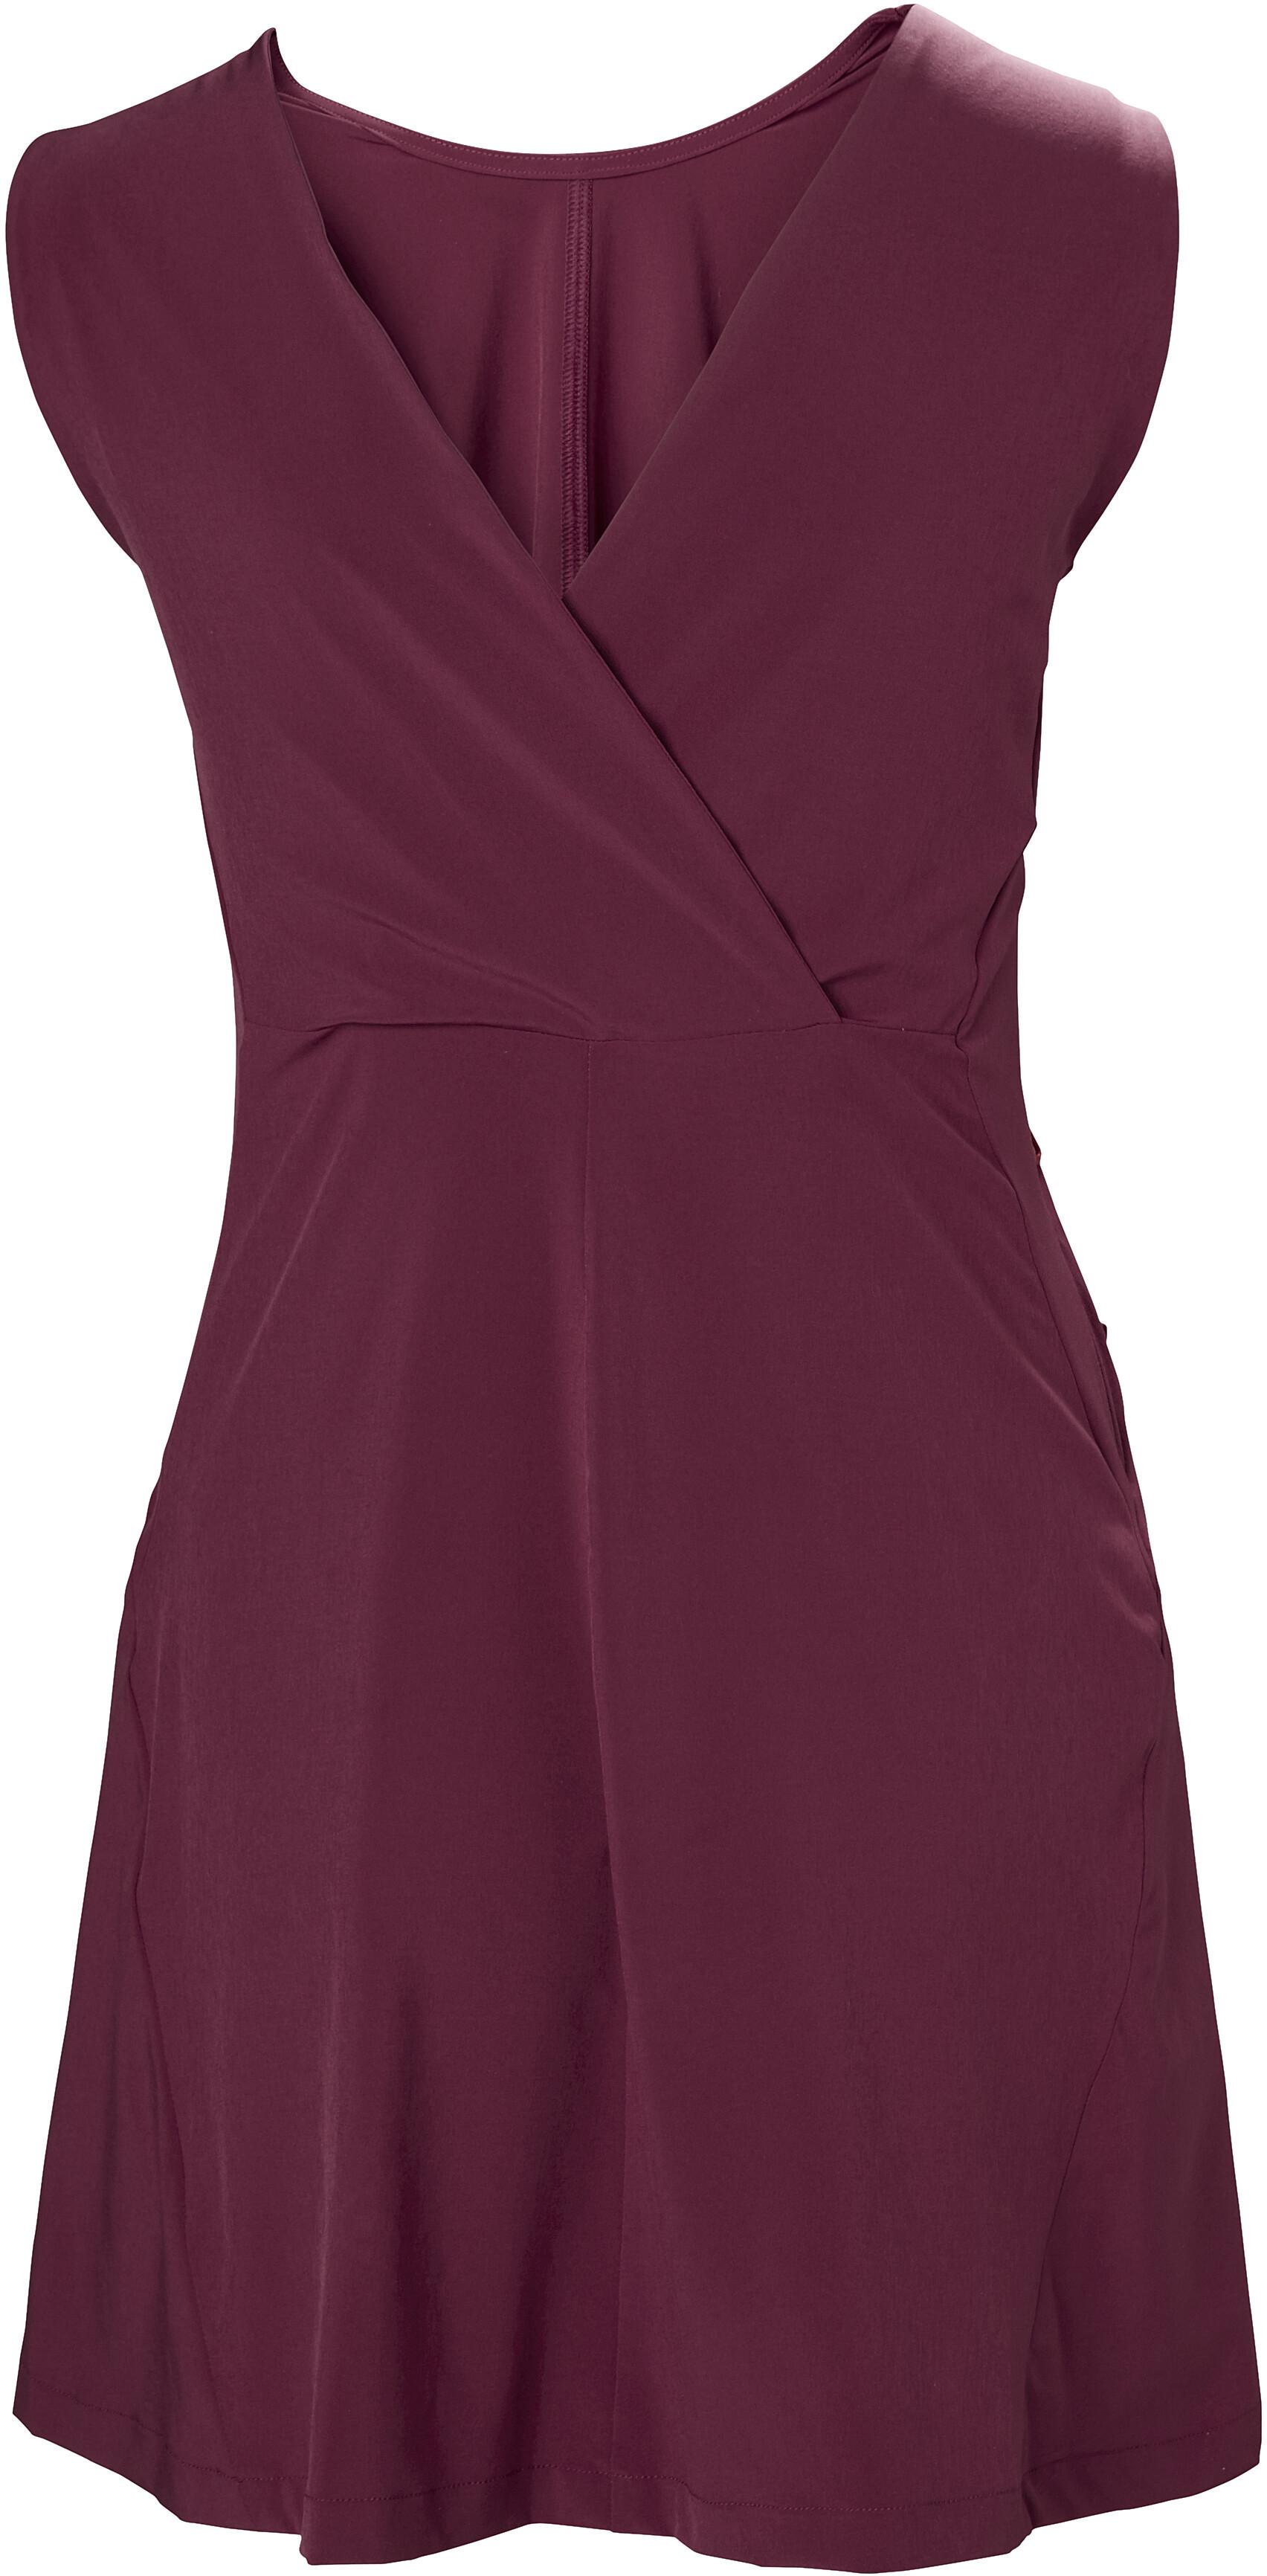 bcc7f746594 Helly Hansen Vik - Robe Femme - violet sur CAMPZ !